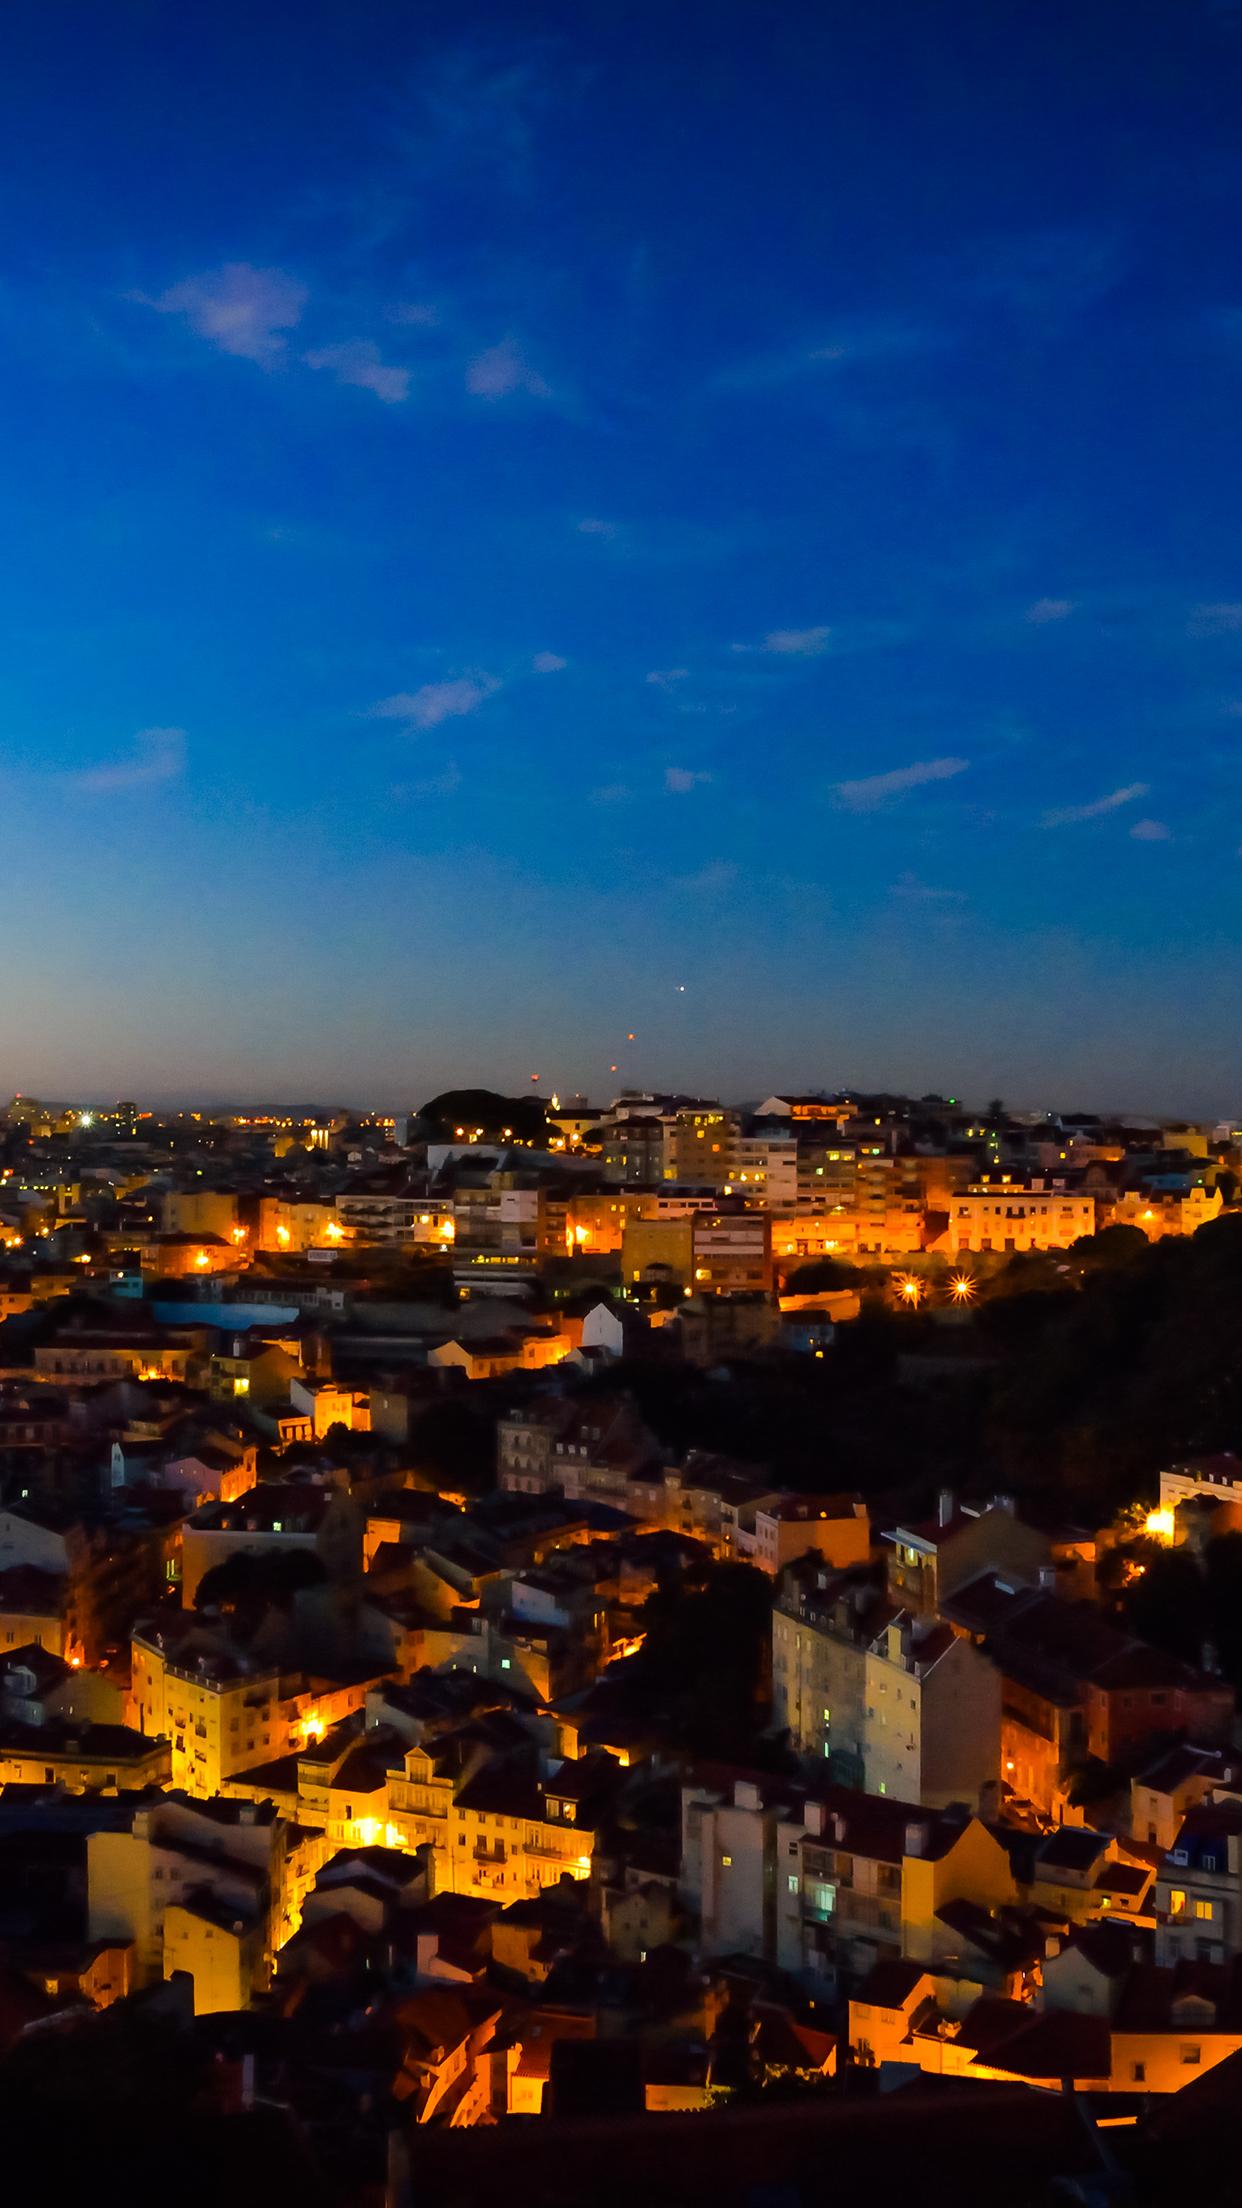 lisboa portugal wallpaper for iphone x 8 7 6 free